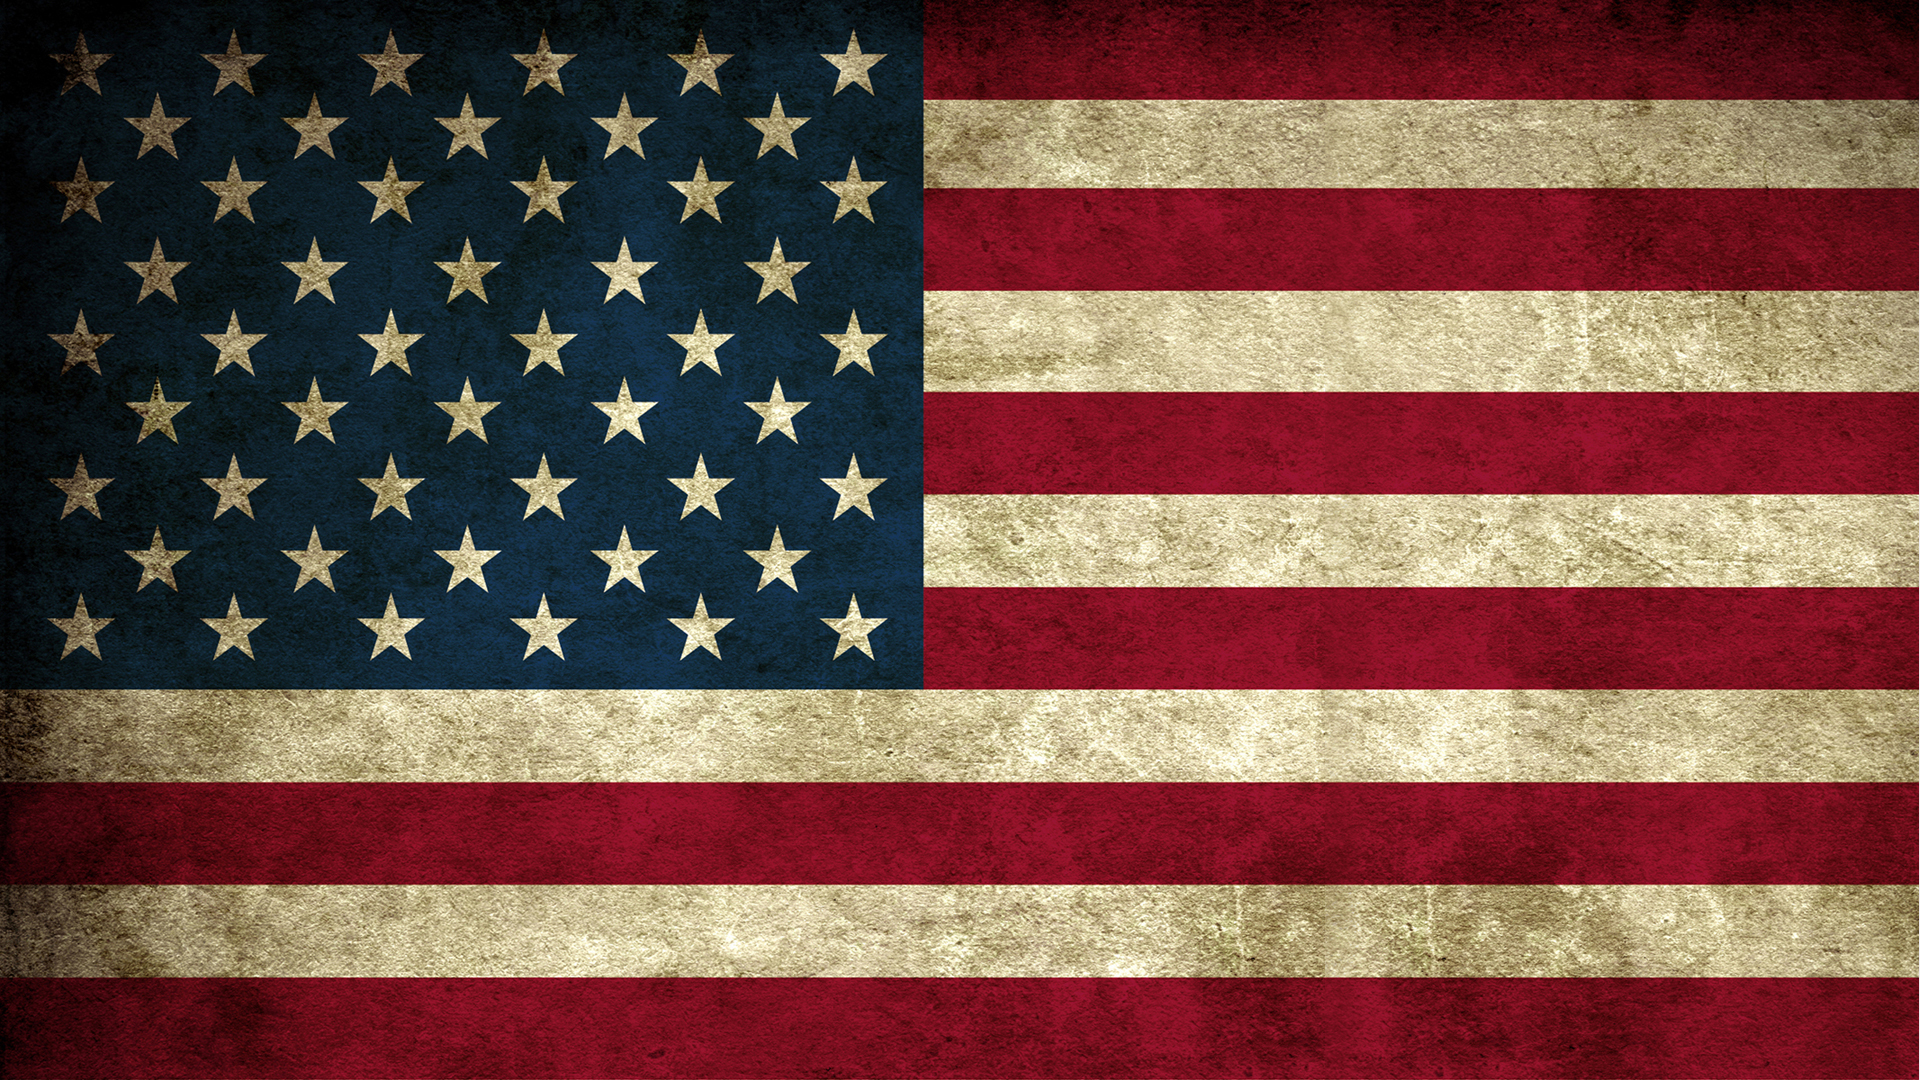 United States of America USA flag full hd wallpaper 1920x1080